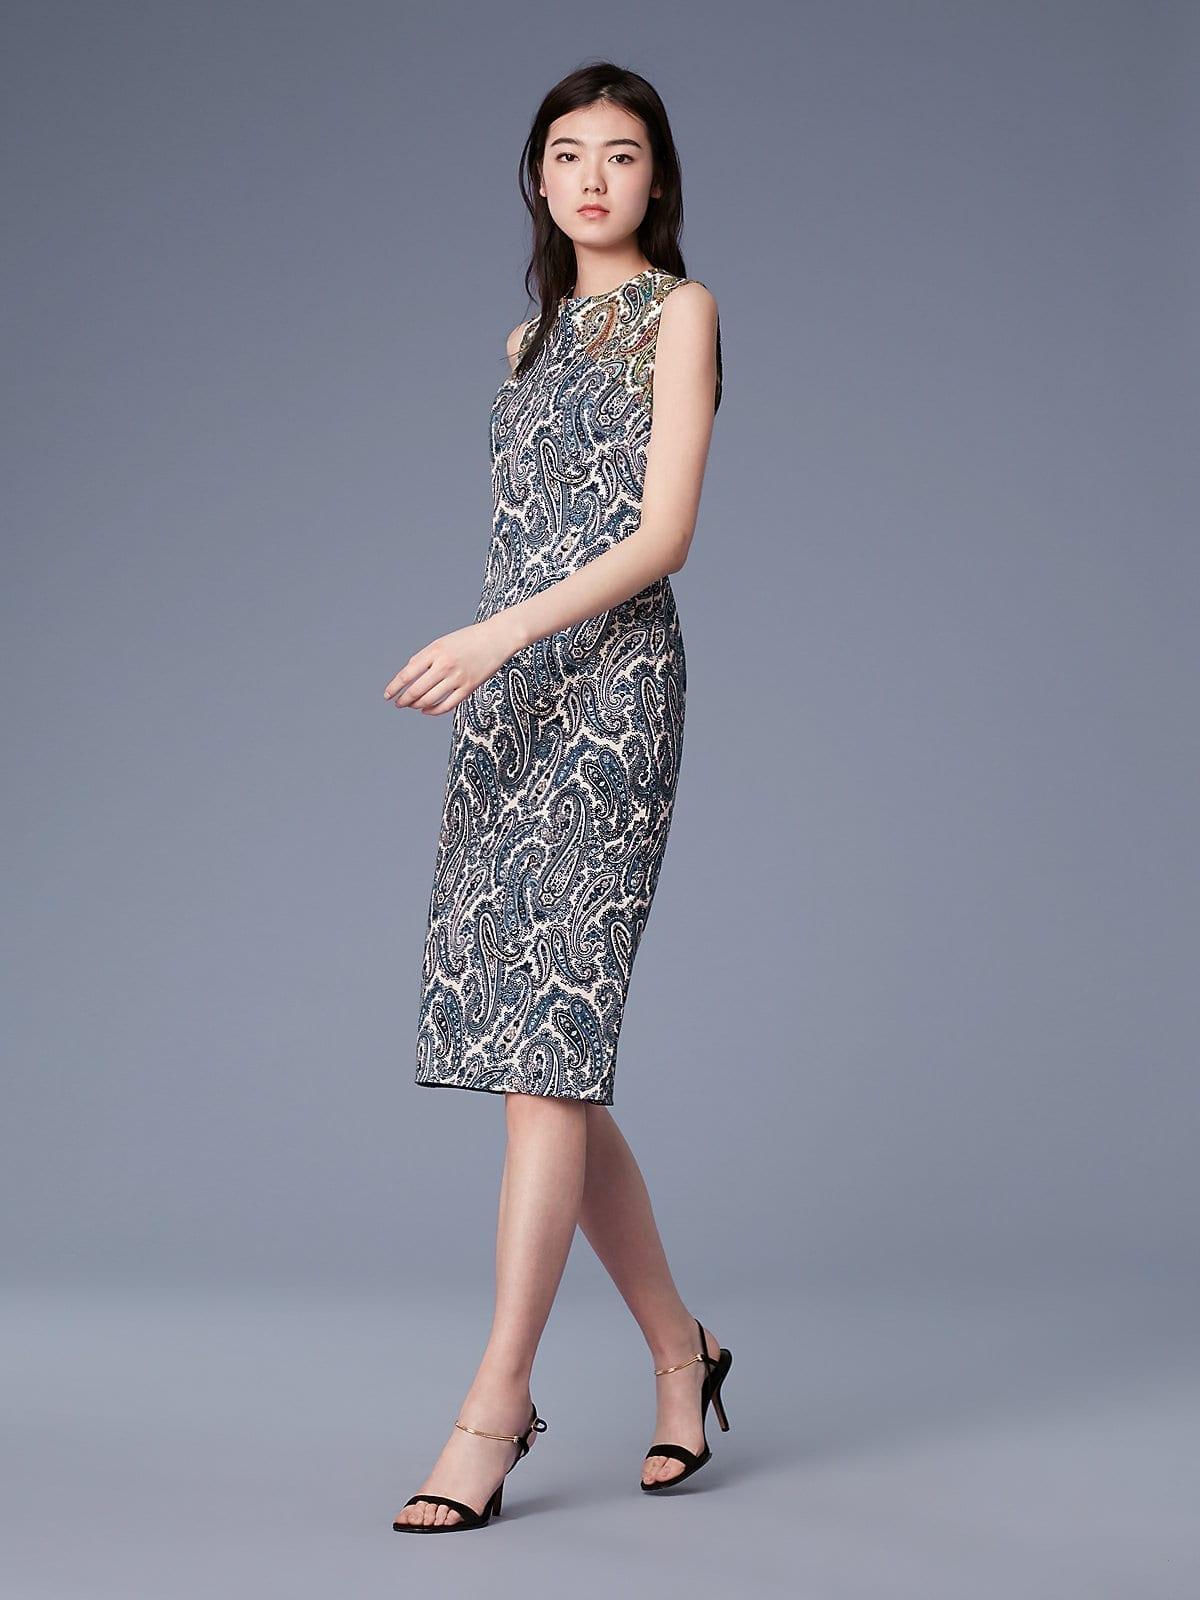 Diane Von Furstenberg Sleeveless Sheath Multicolored Dress